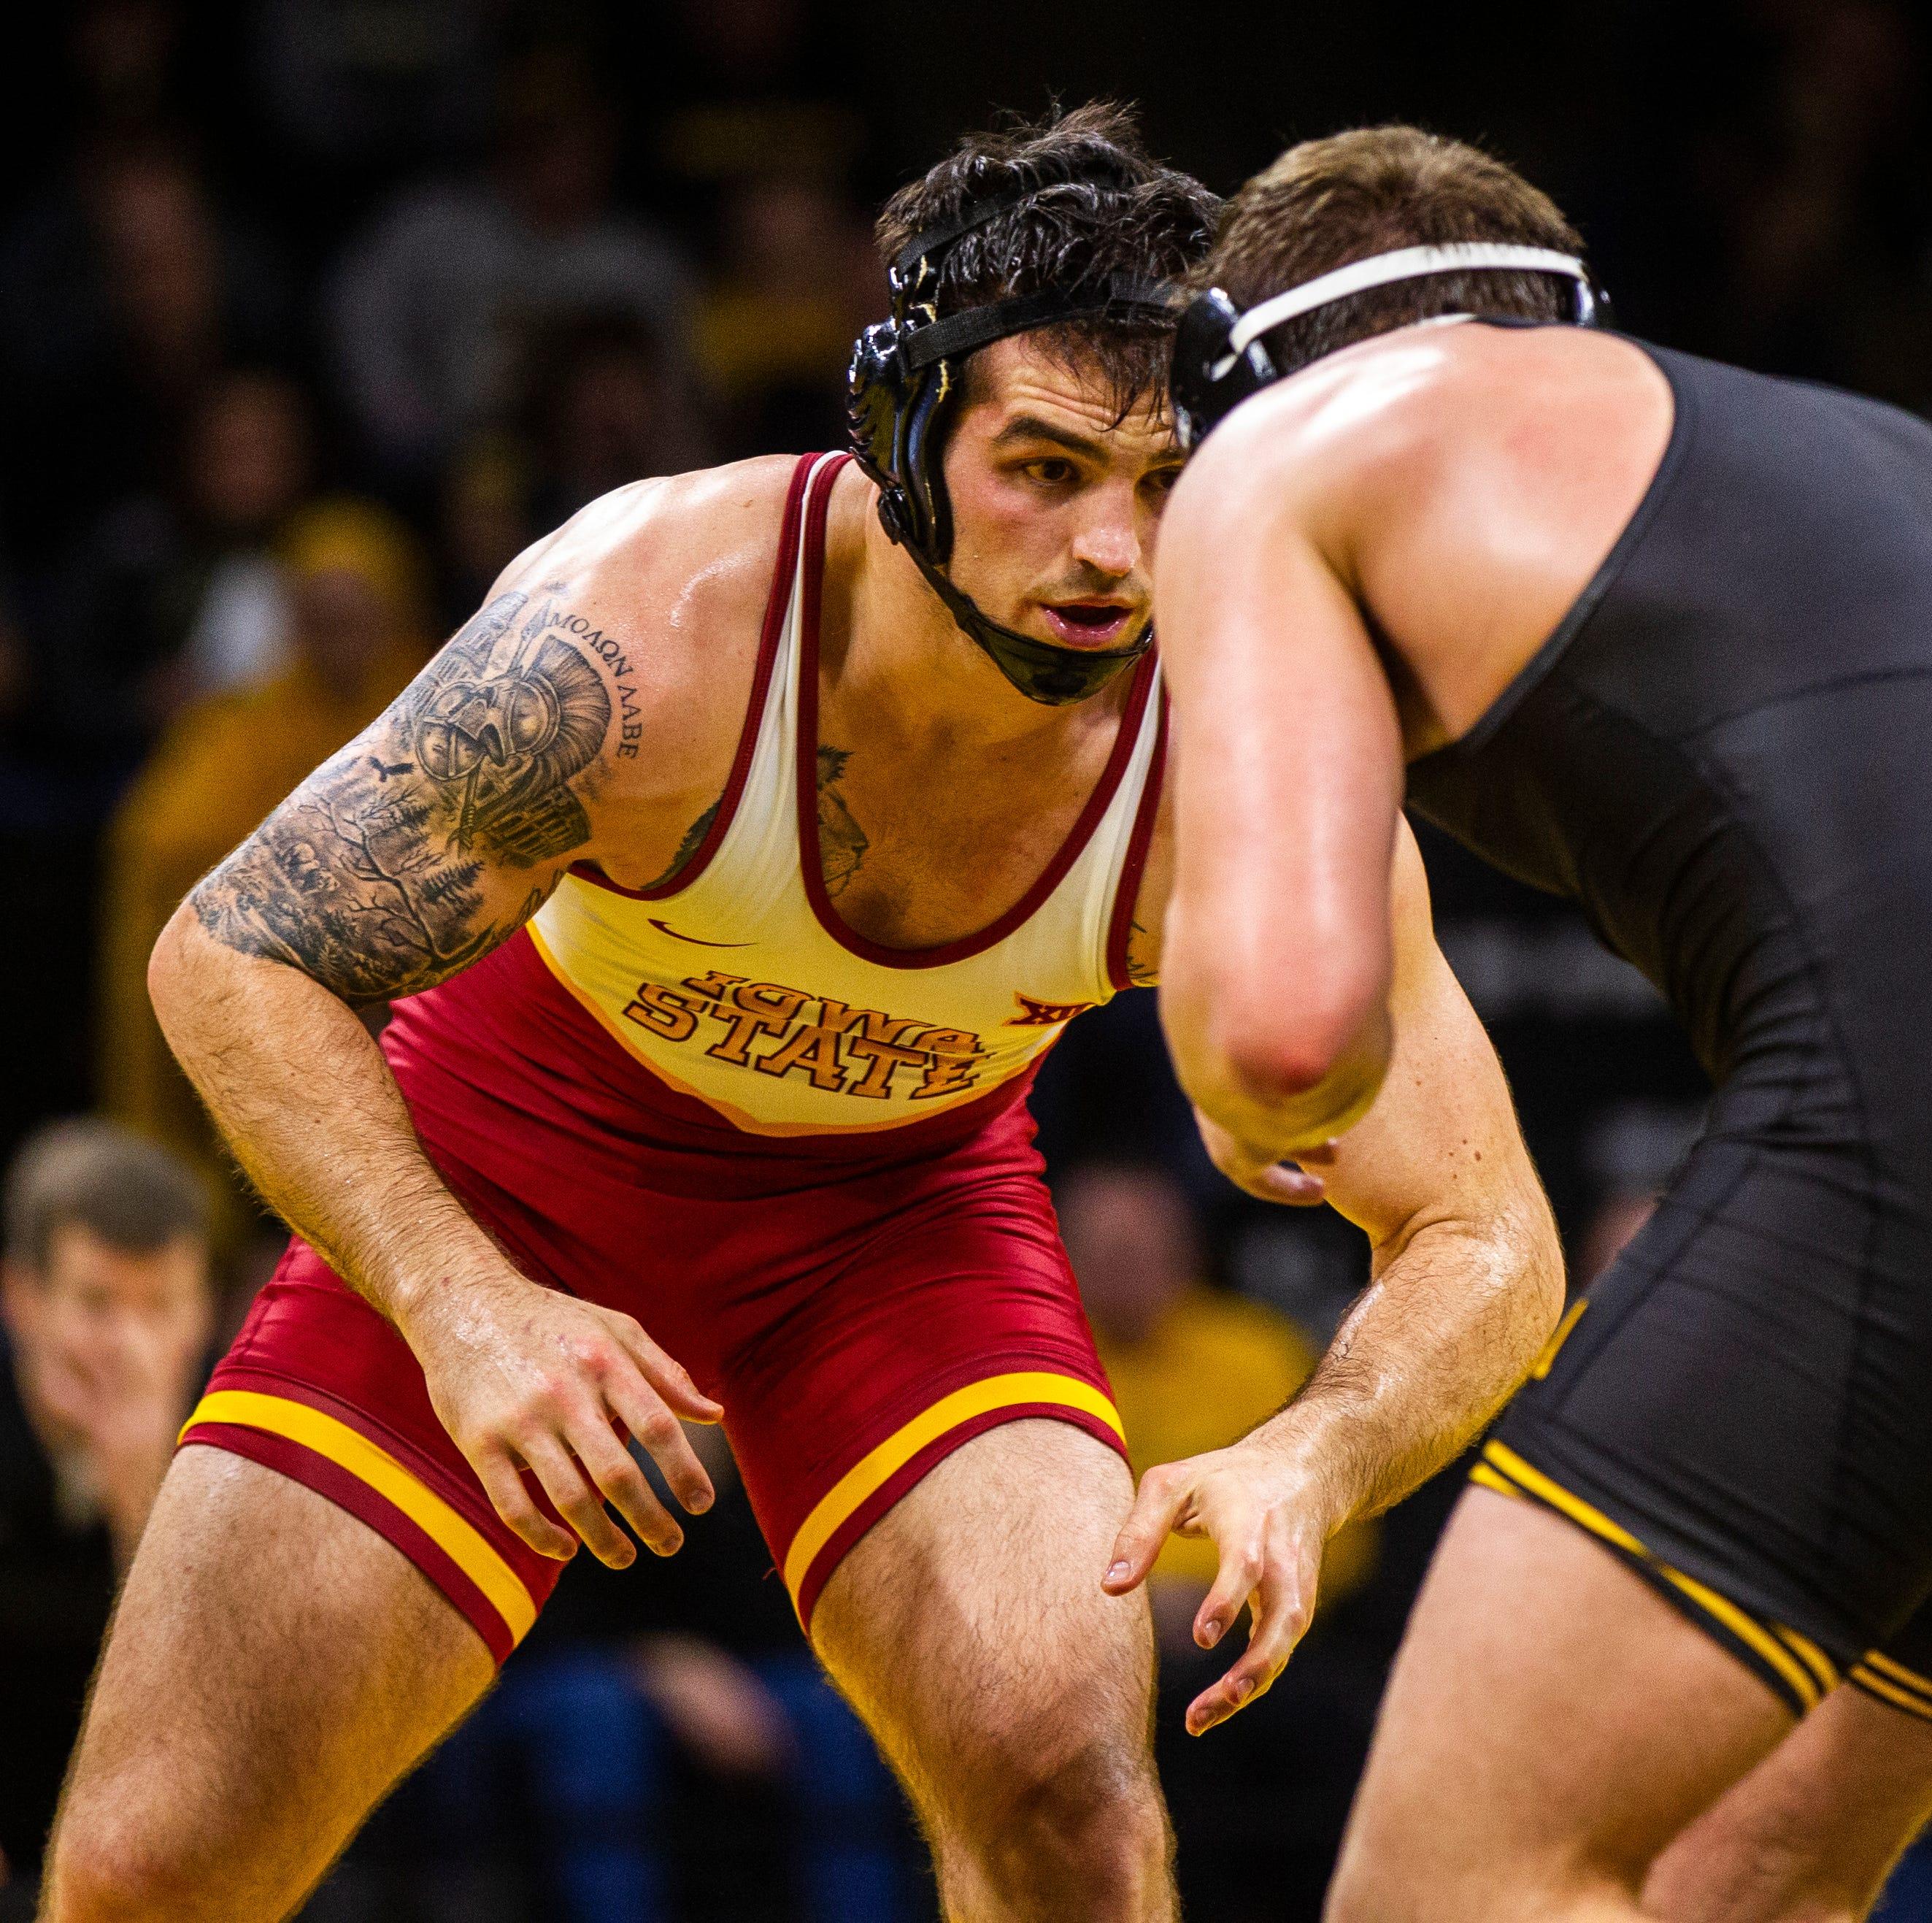 Wrestling Mailbag: Willie Miklus, Big Ten seeds, Alex Marinelli and Sam Stoll